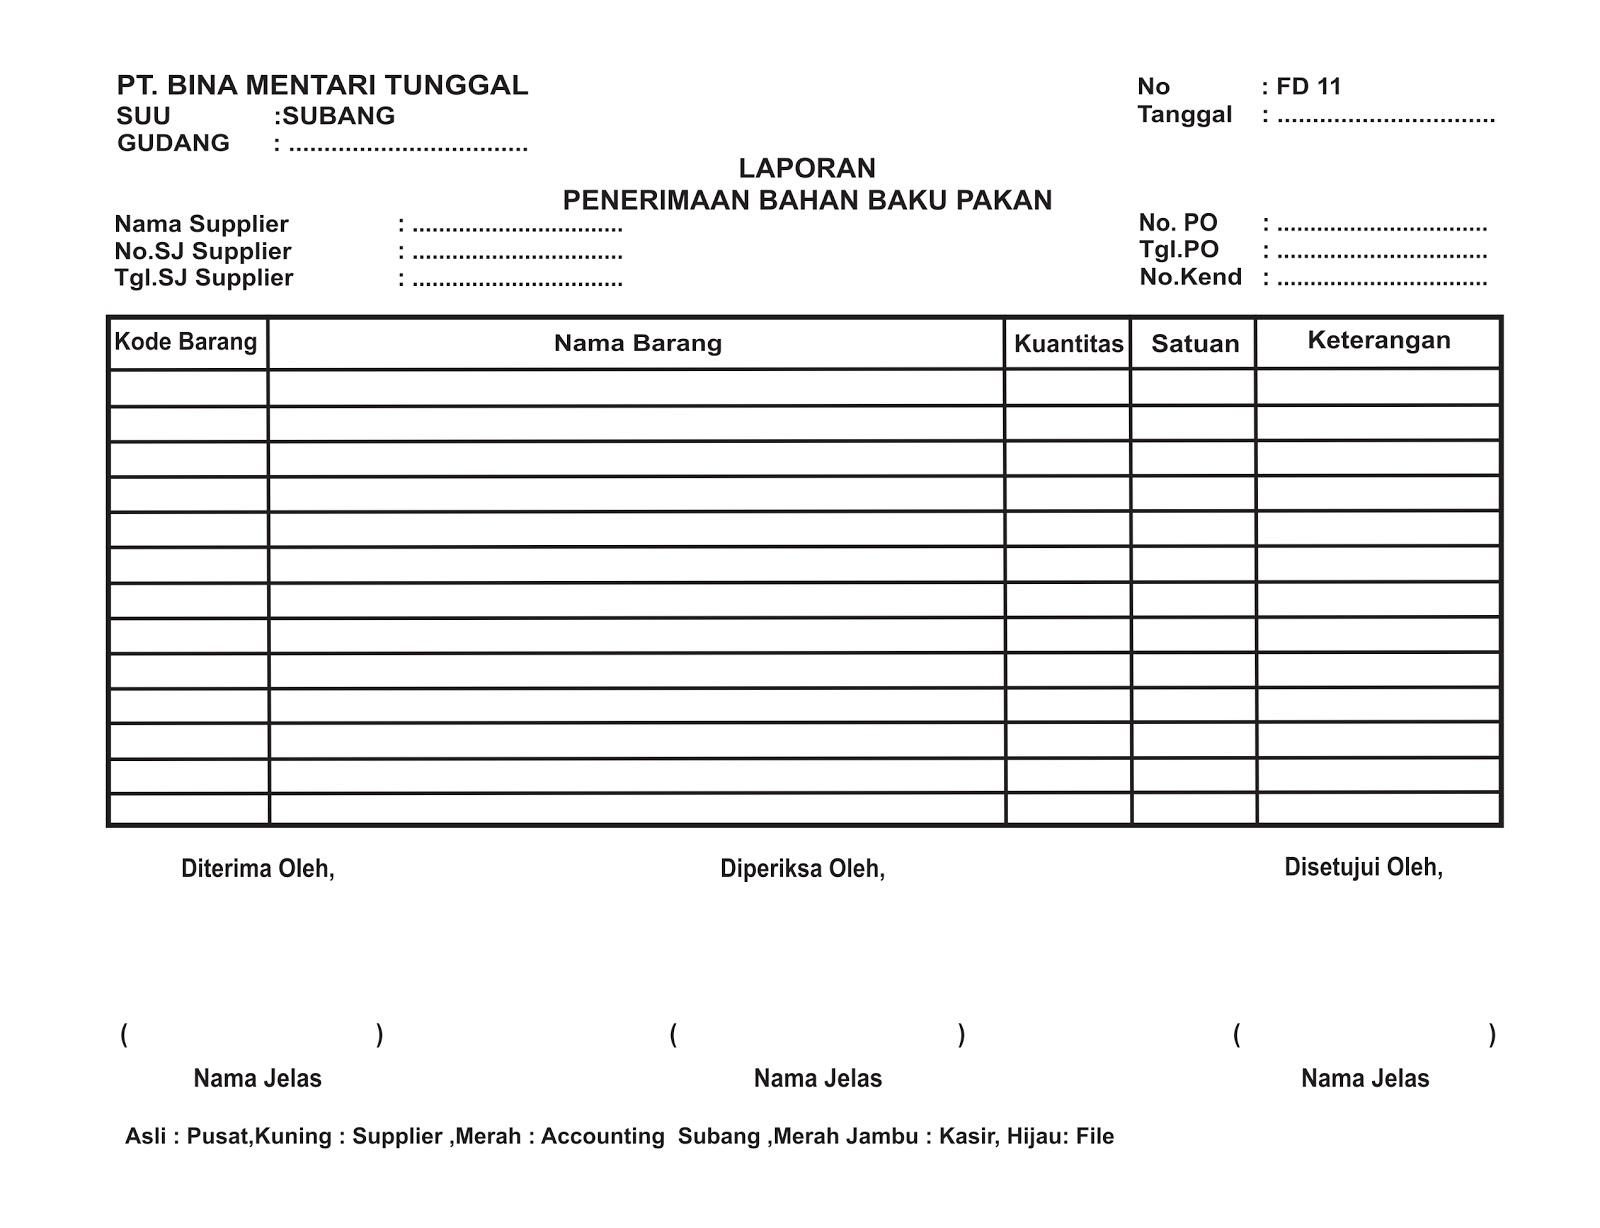 Contoh Faktur Bpkb Mobil - Contoh Kri